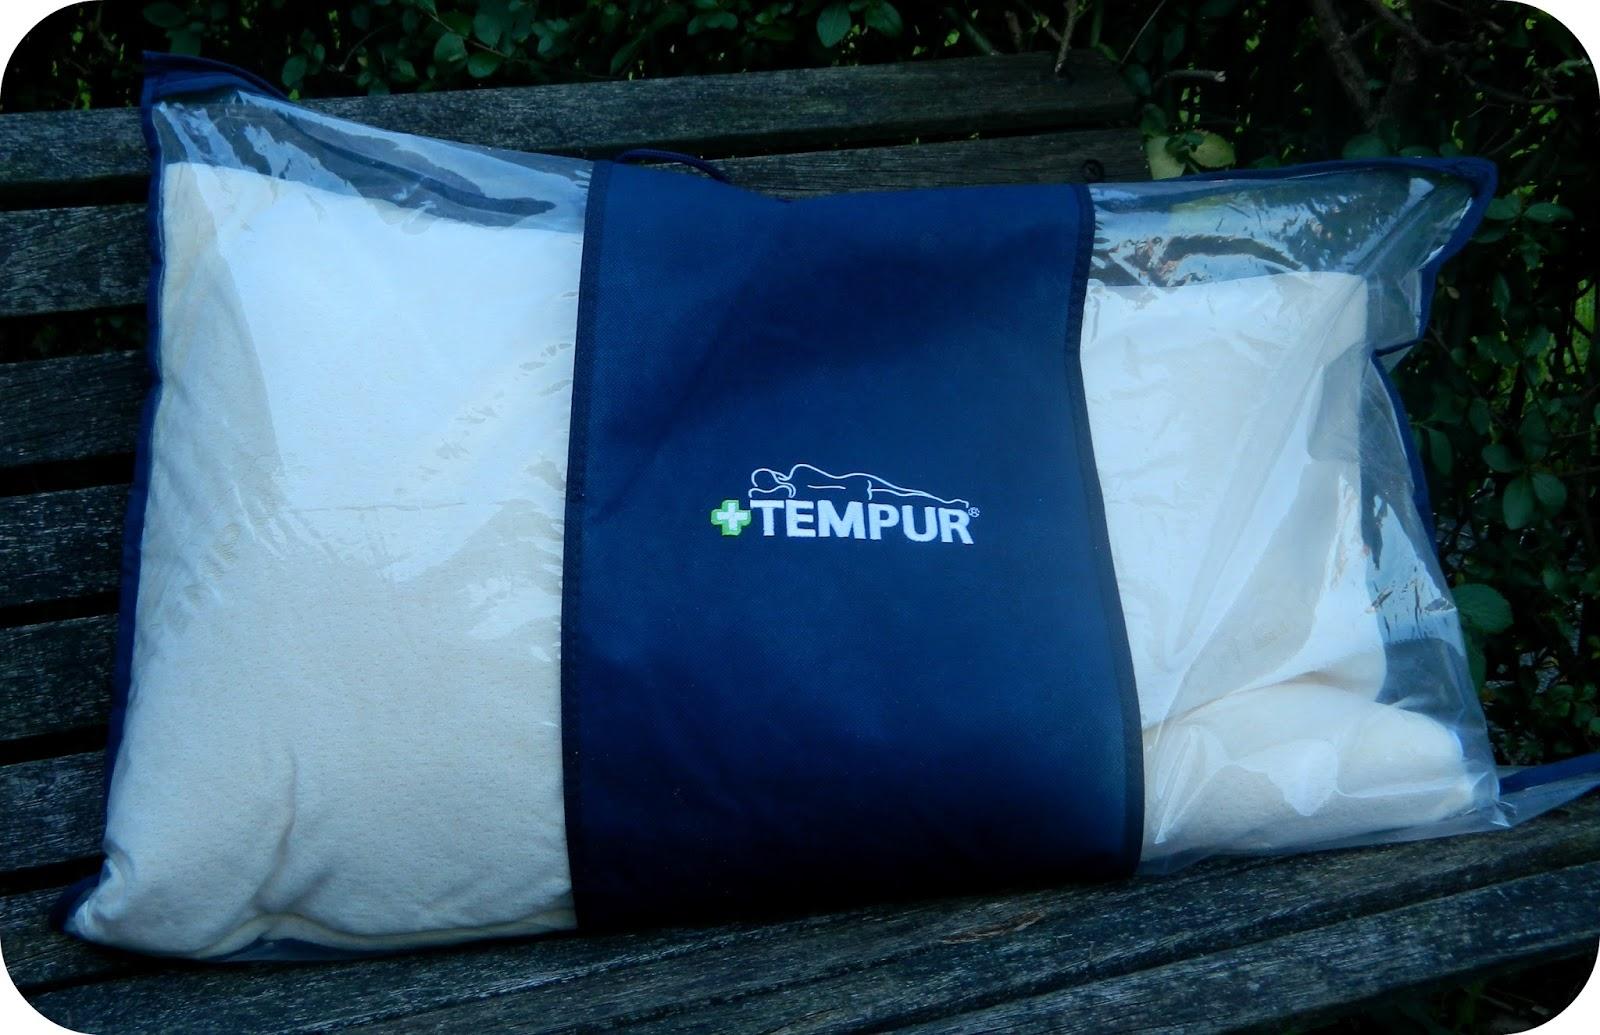 Booth's Furniture Tempur Pillow